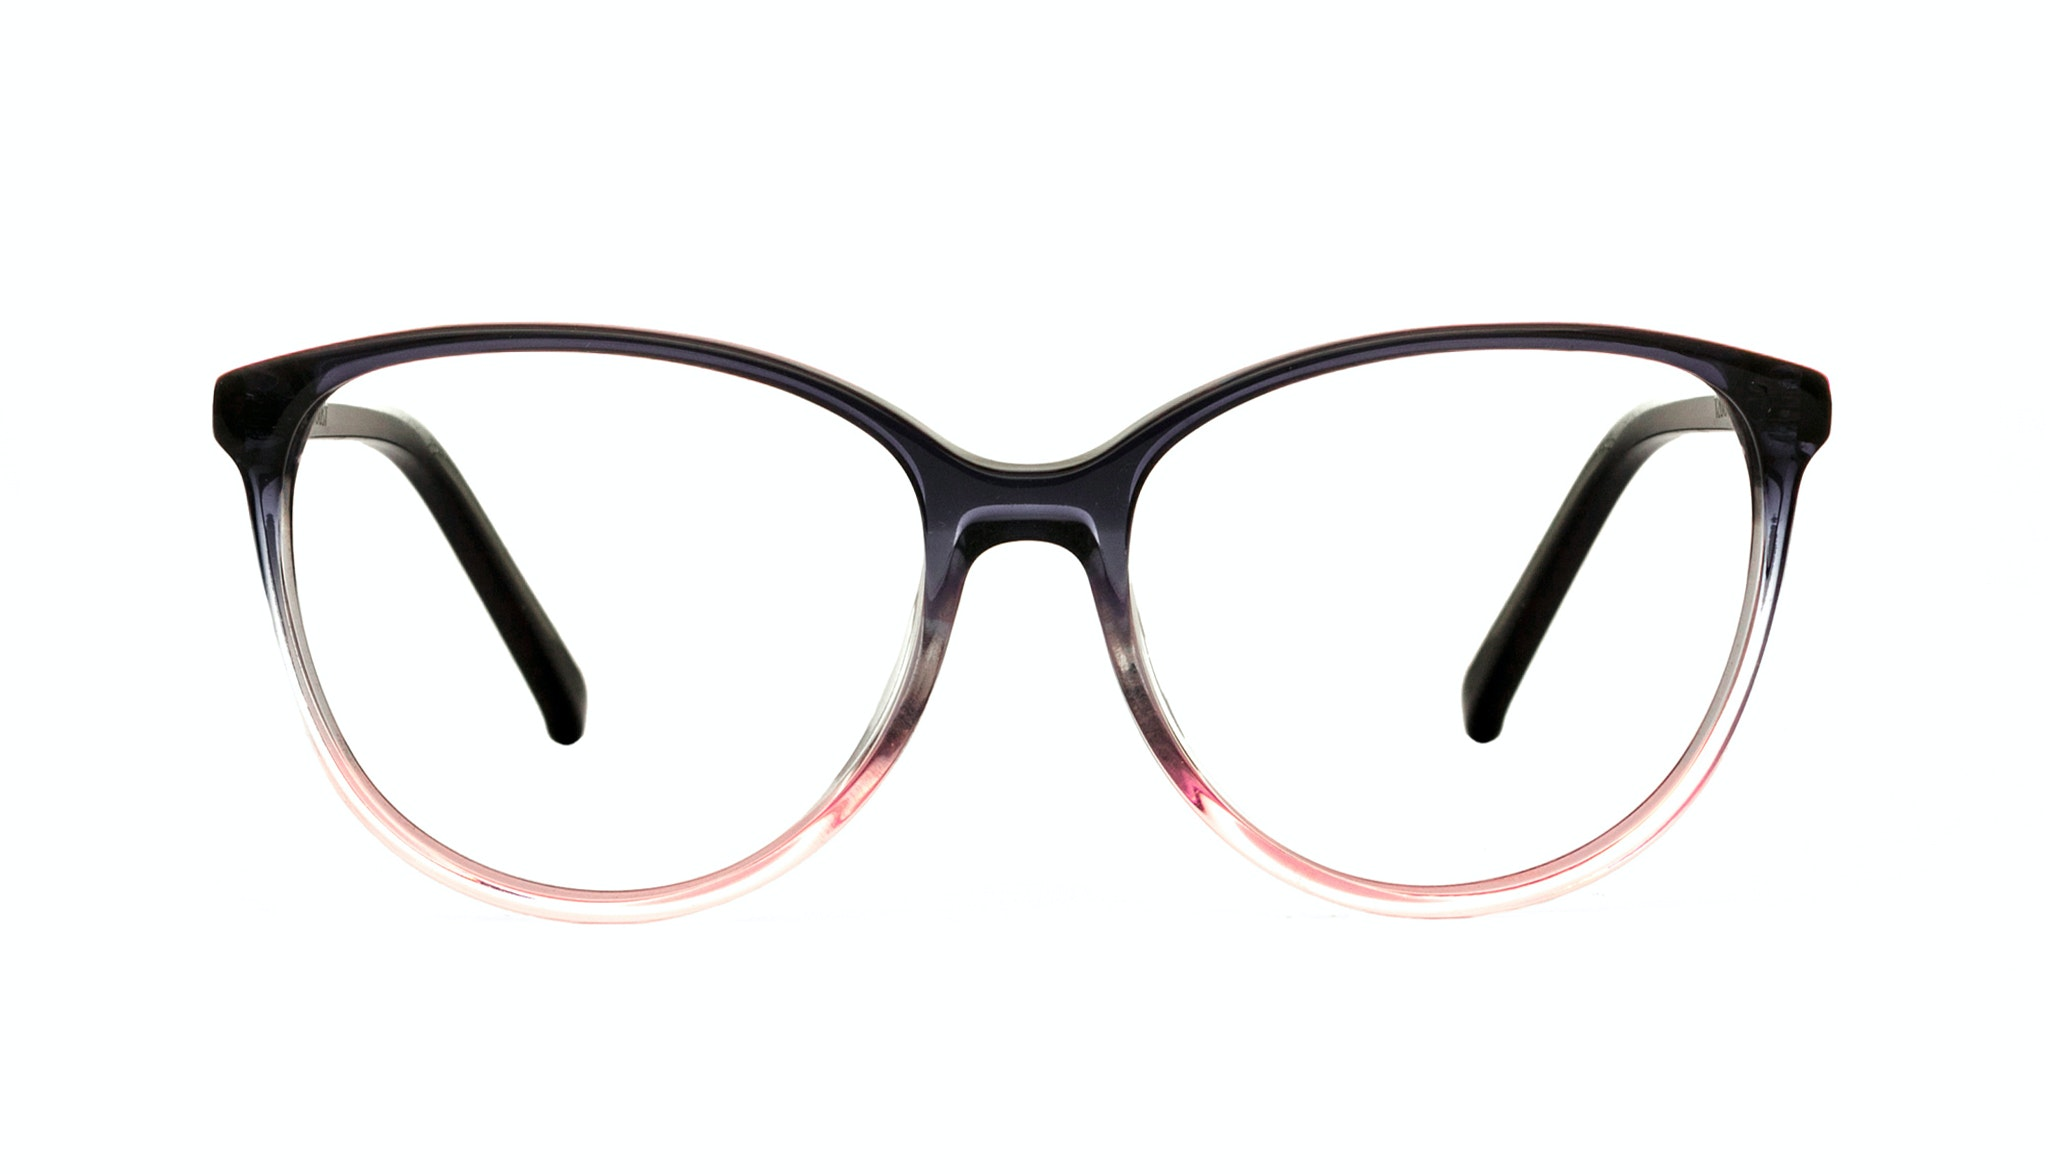 Affordable Fashion Glasses Round Eyeglasses Women Imagine Pink Dust